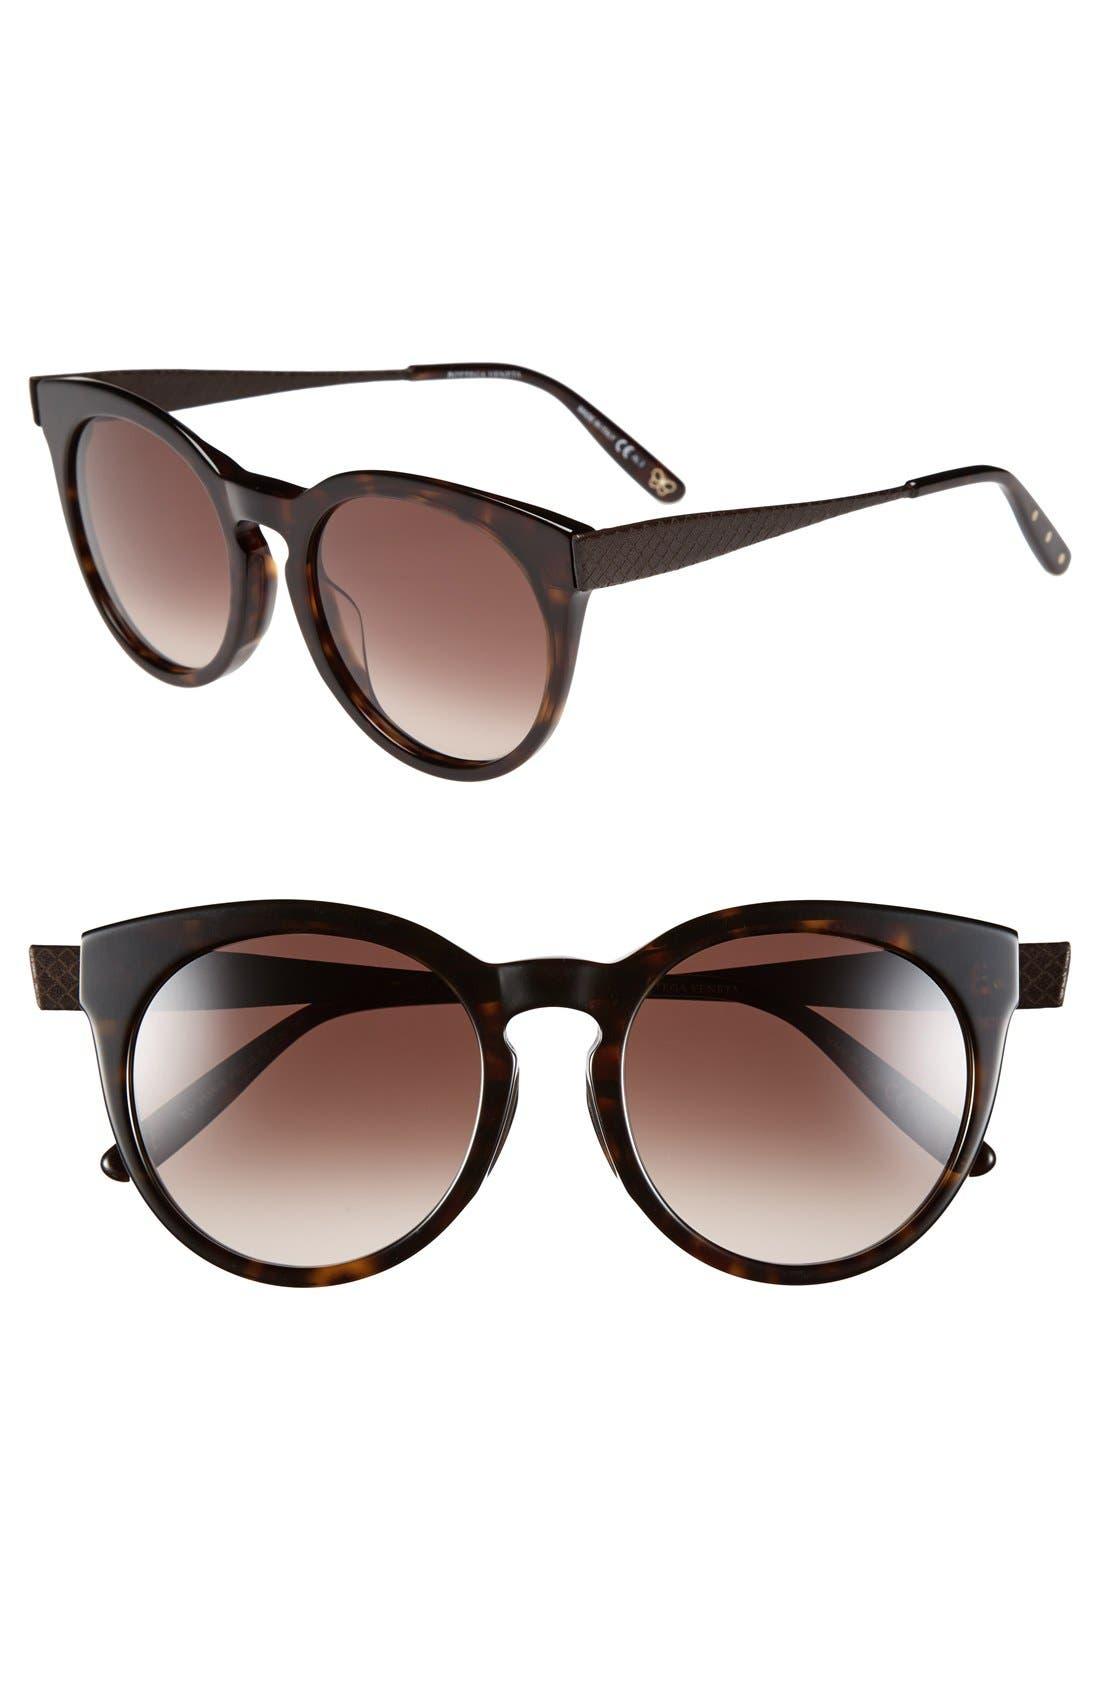 Alternate Image 1 Selected - Bottega Veneta 52mm Special Fit Sunglasses